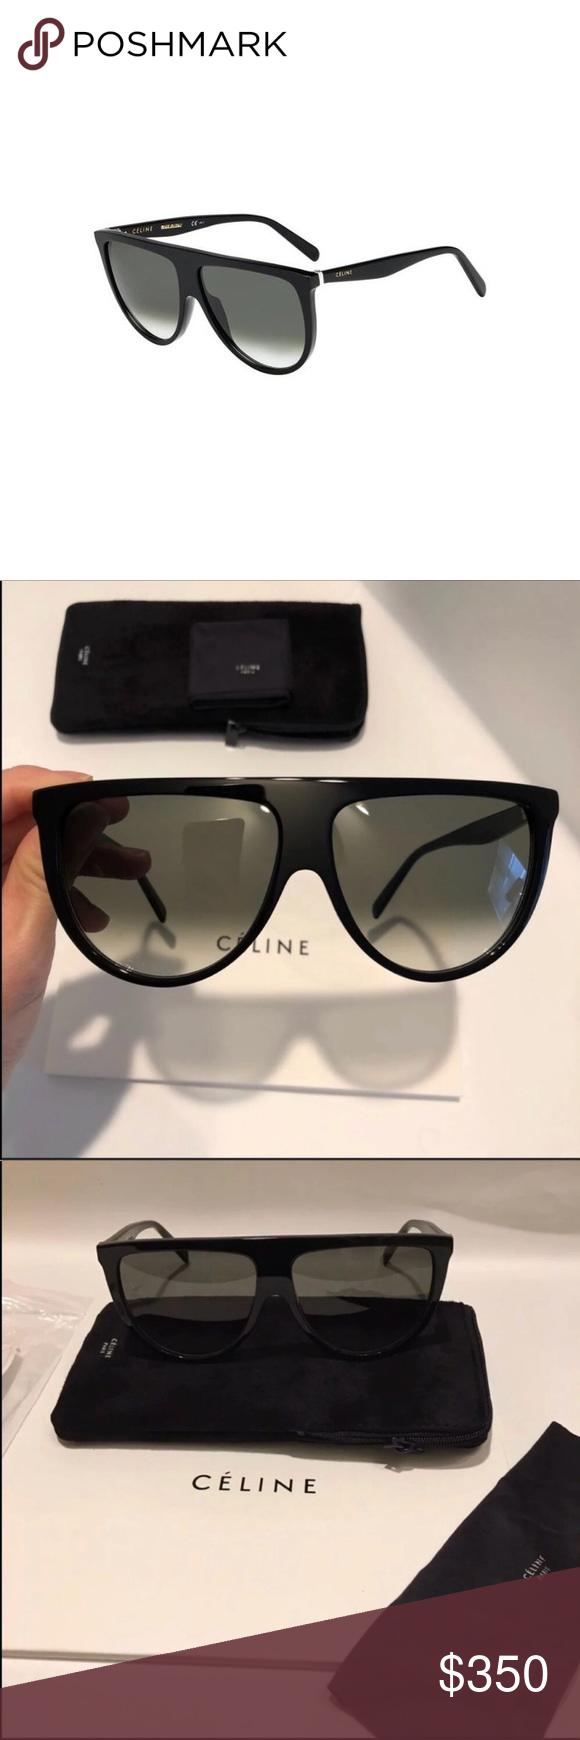 e51b676835e2 Celine Thin shadow sunglasses 🔥 Celine 41435 s Thin shadow black grey  green sunglasses